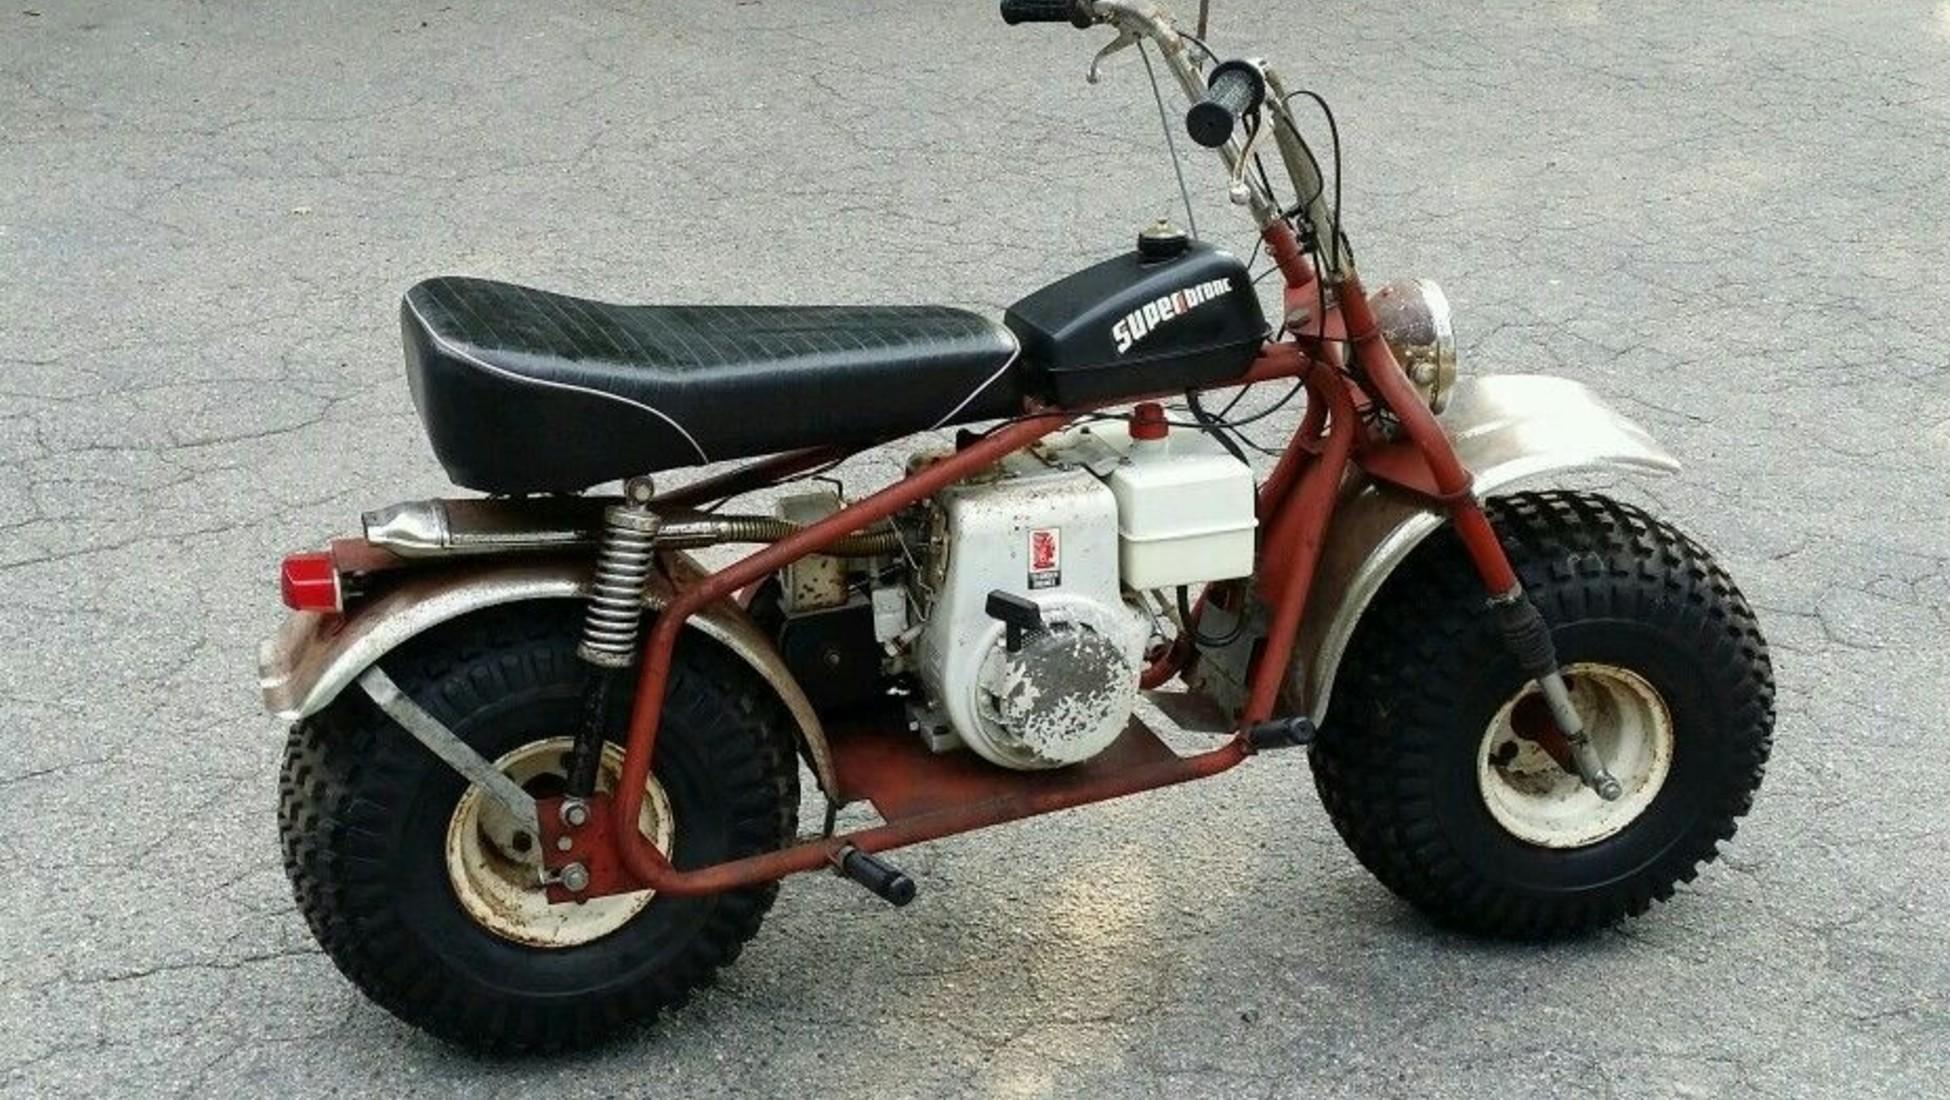 gosta das motos monkey estas s o 5 das mini motos mais pequenas do mundo catawiki. Black Bedroom Furniture Sets. Home Design Ideas